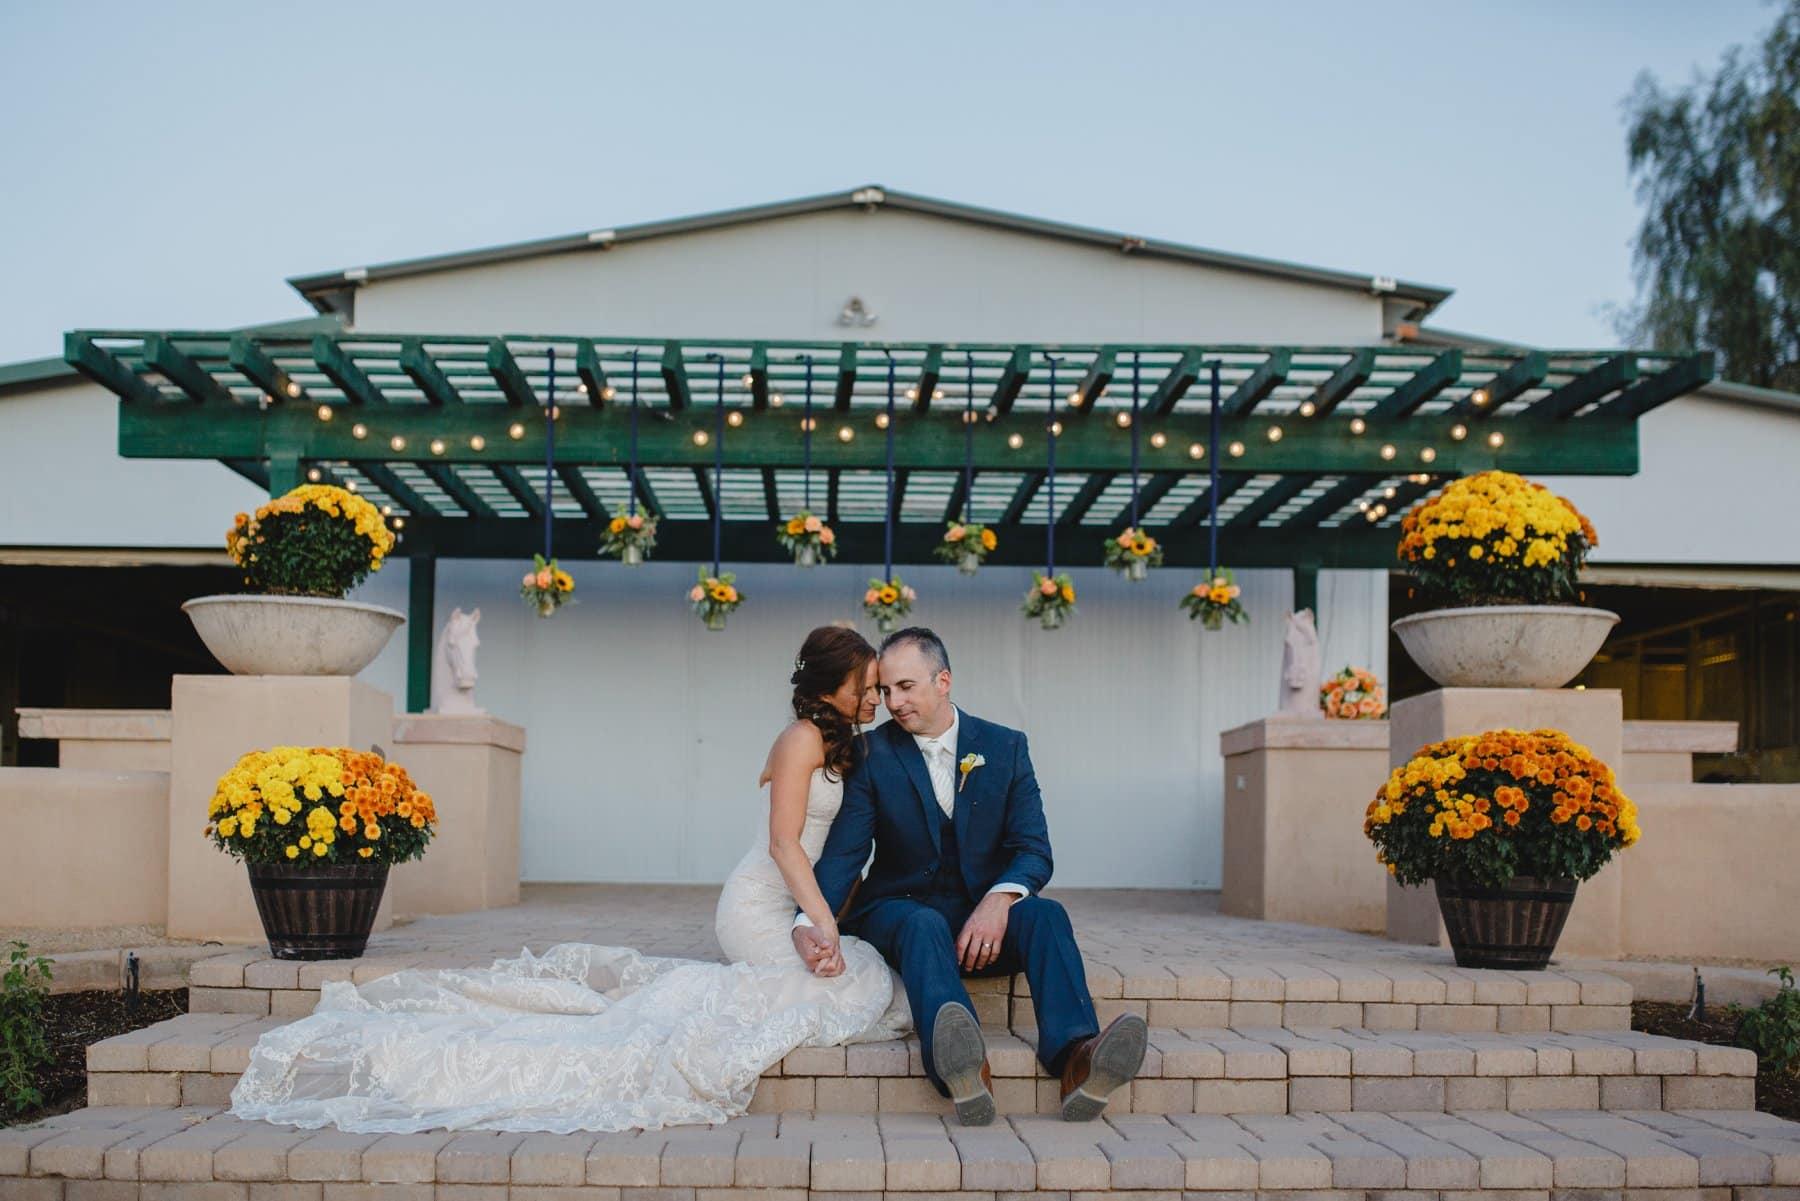 rustic elegant small wedding at a horse barn in Cave Creek, AZ